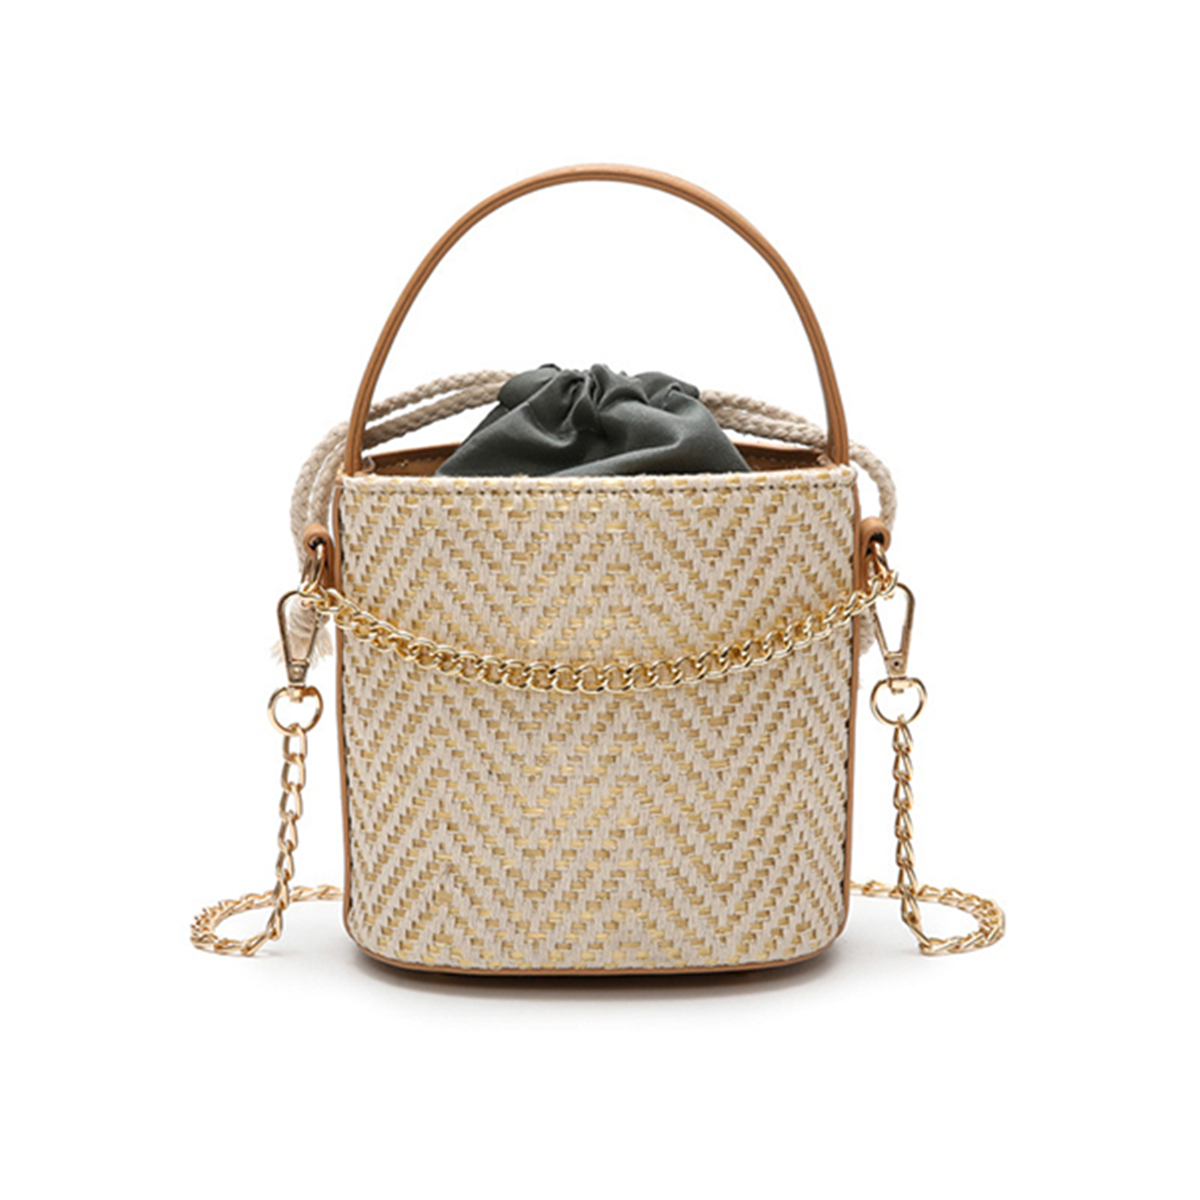 Women-Straw-Bucket-Handbag-Portable-Beach-Solid-Travel-Messenger-Crossbody-Bag